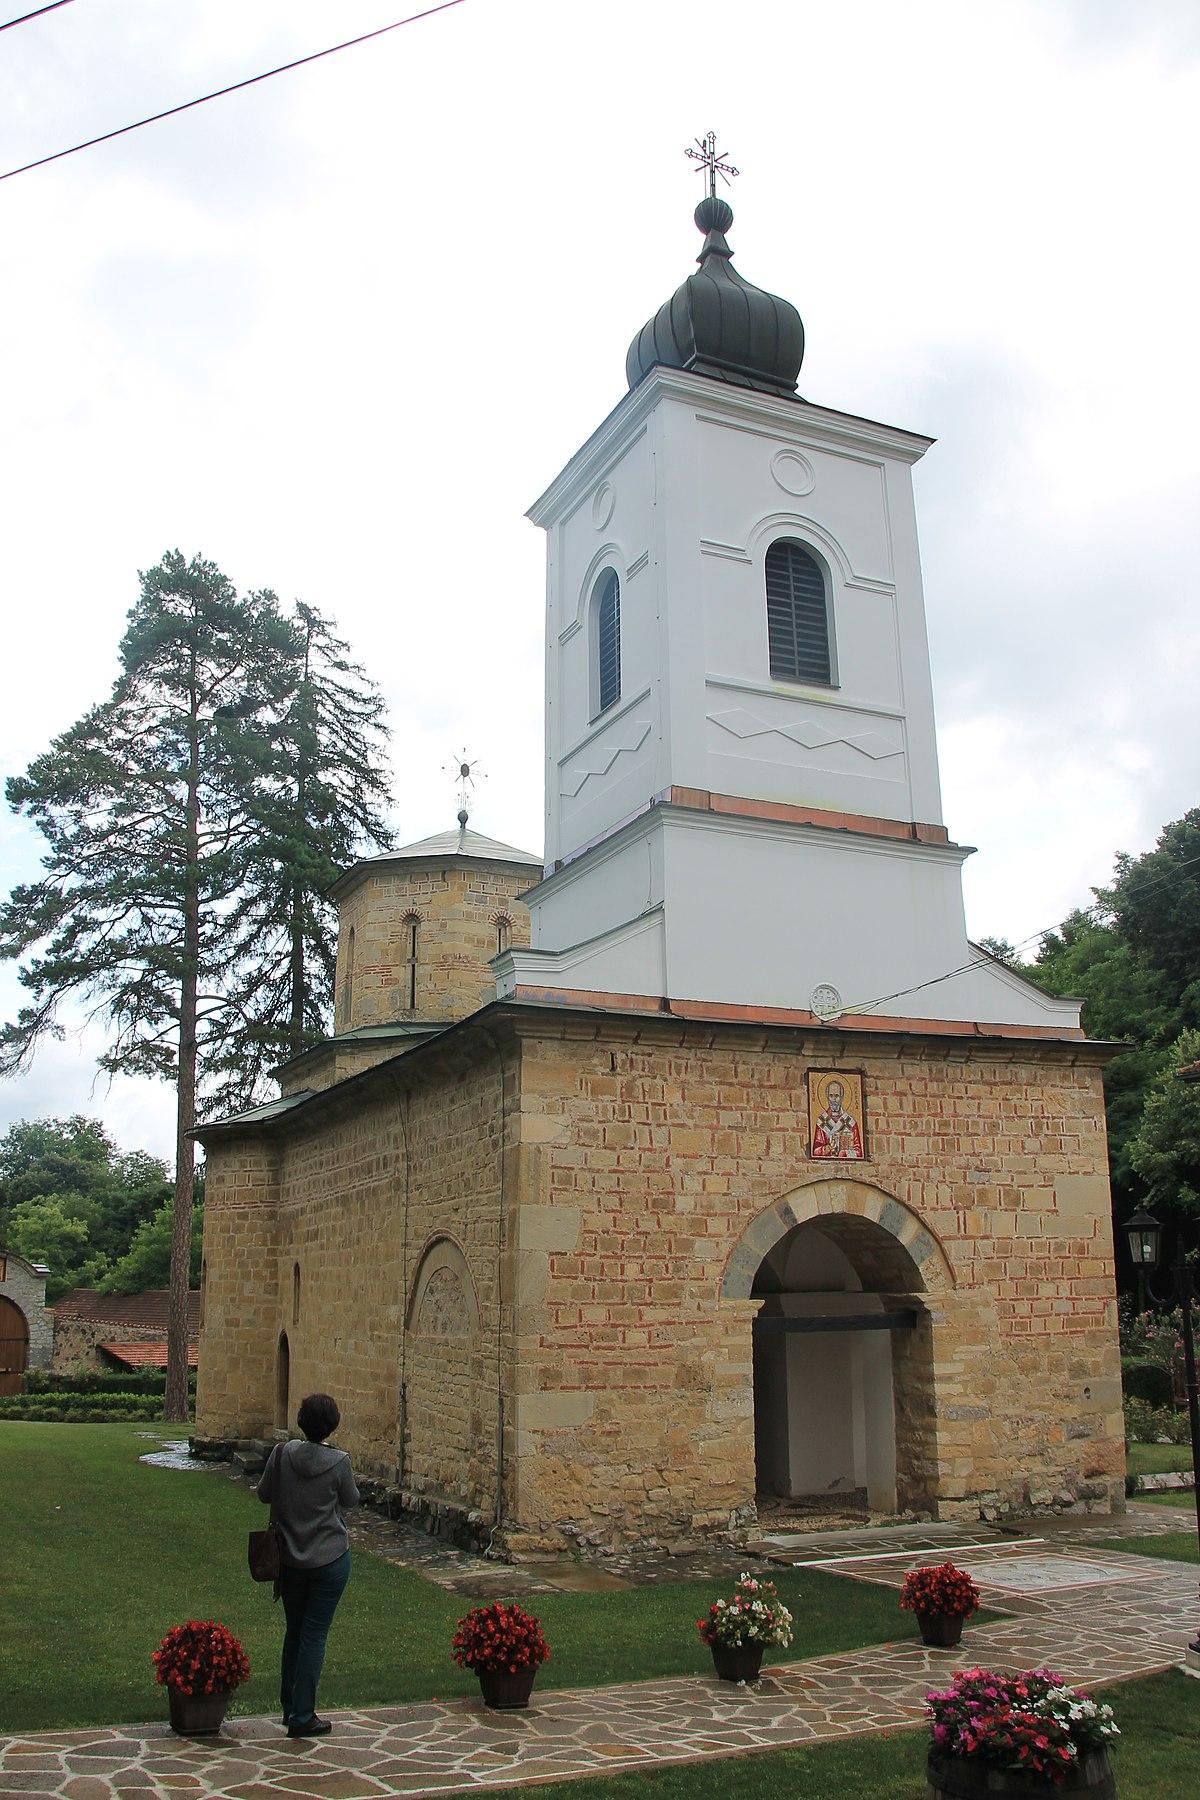 Manastir Dracha Vikipediјa Slobodna Enciklopediјa